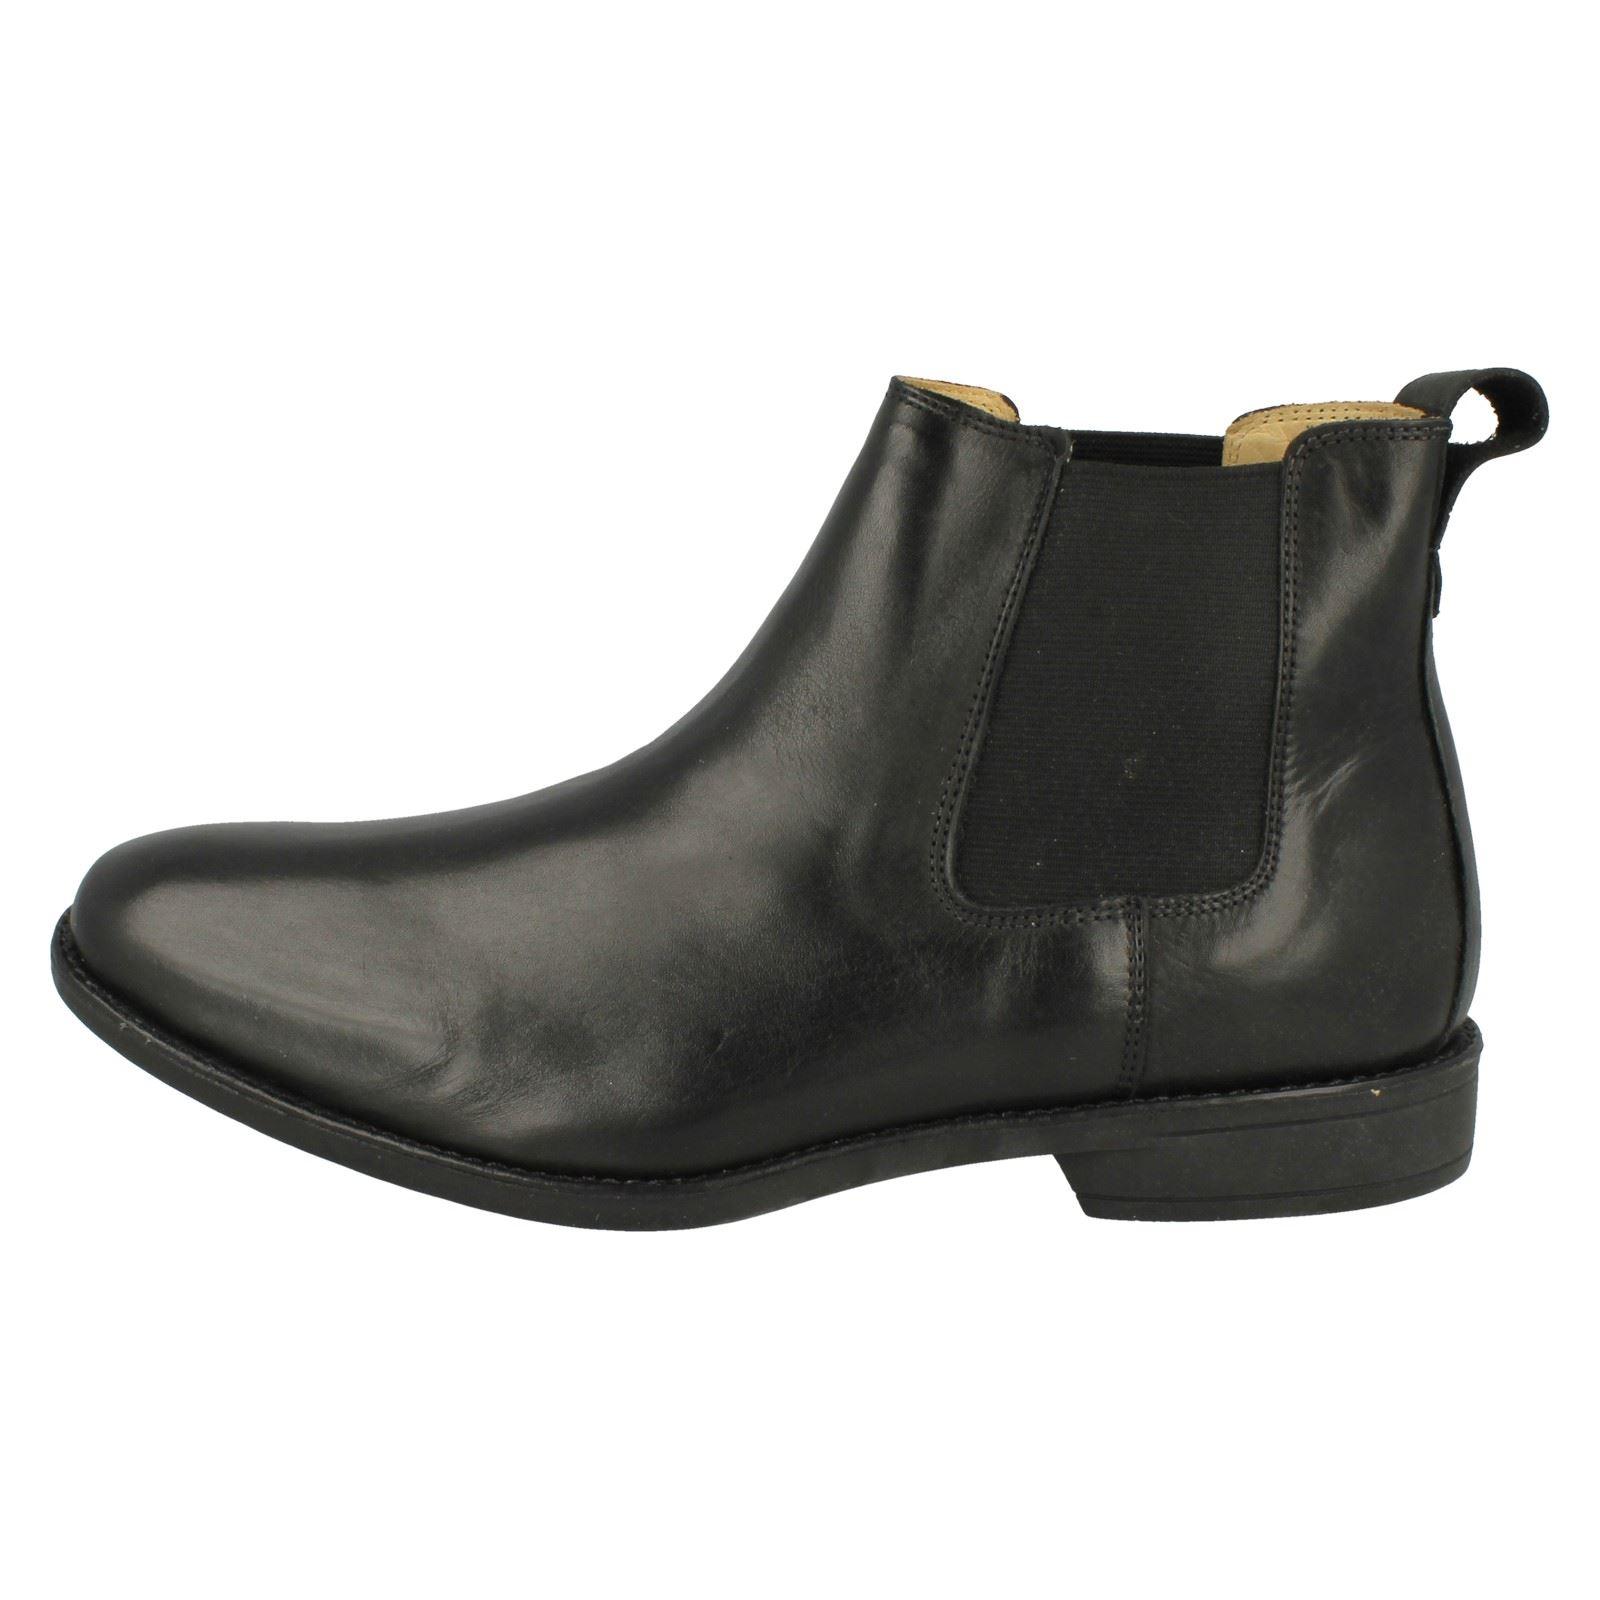 Mens-Anatomic-Chelsea-Boots-039-929211LB-039 thumbnail 6